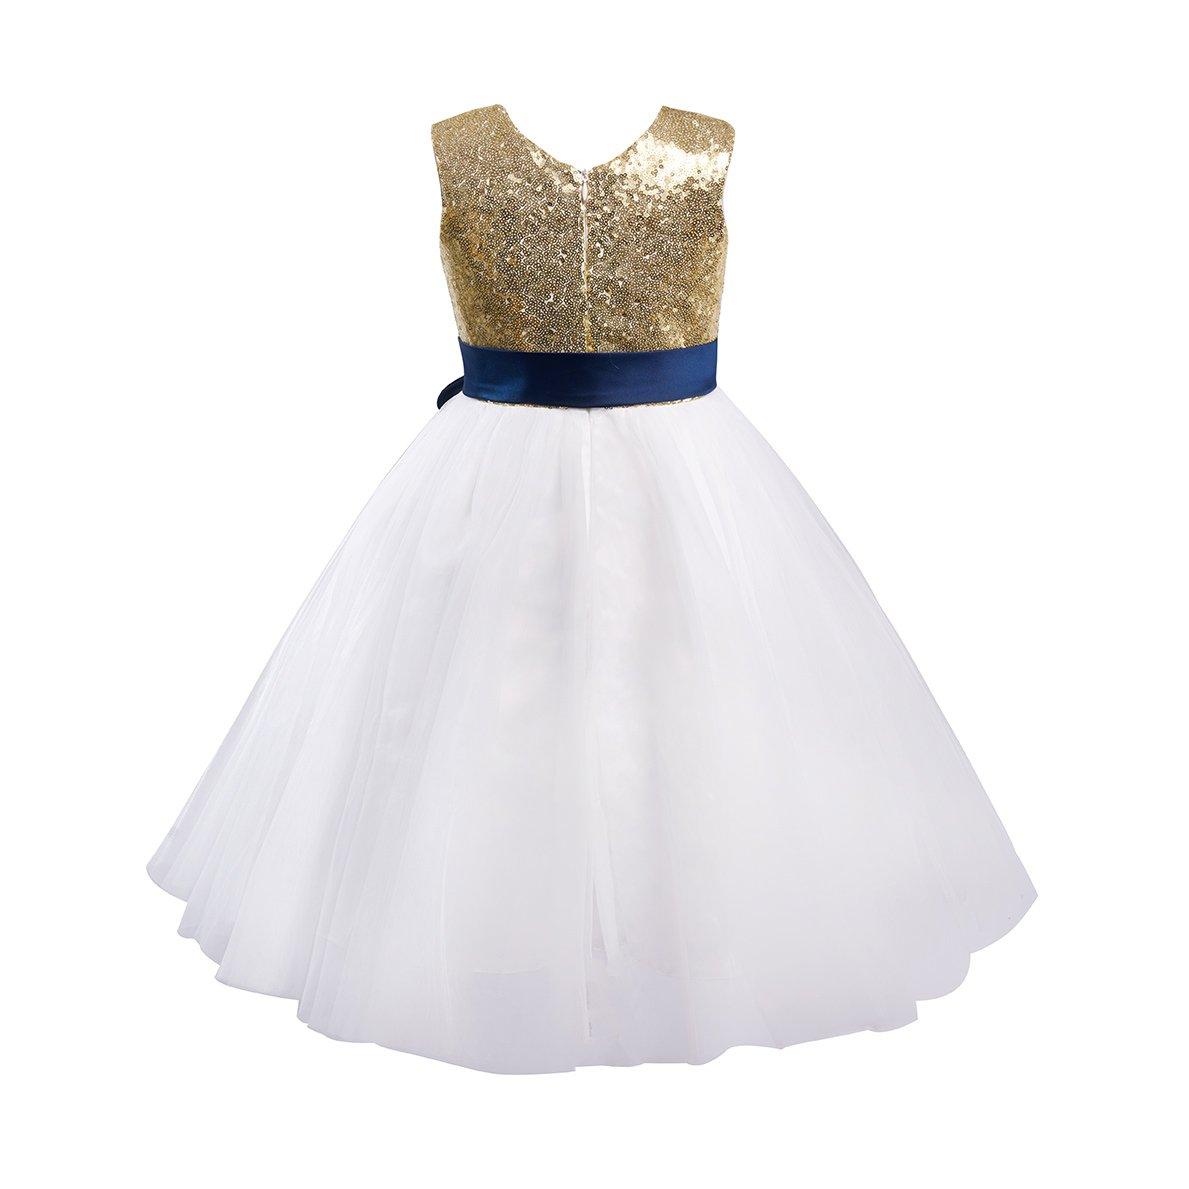 6f47e5b9e66c5 Amazon.com  Miama Gold Sequin Ivory Tulle Wedding Flower Girl Dress Junior  Bridesmaid Dress  Clothing